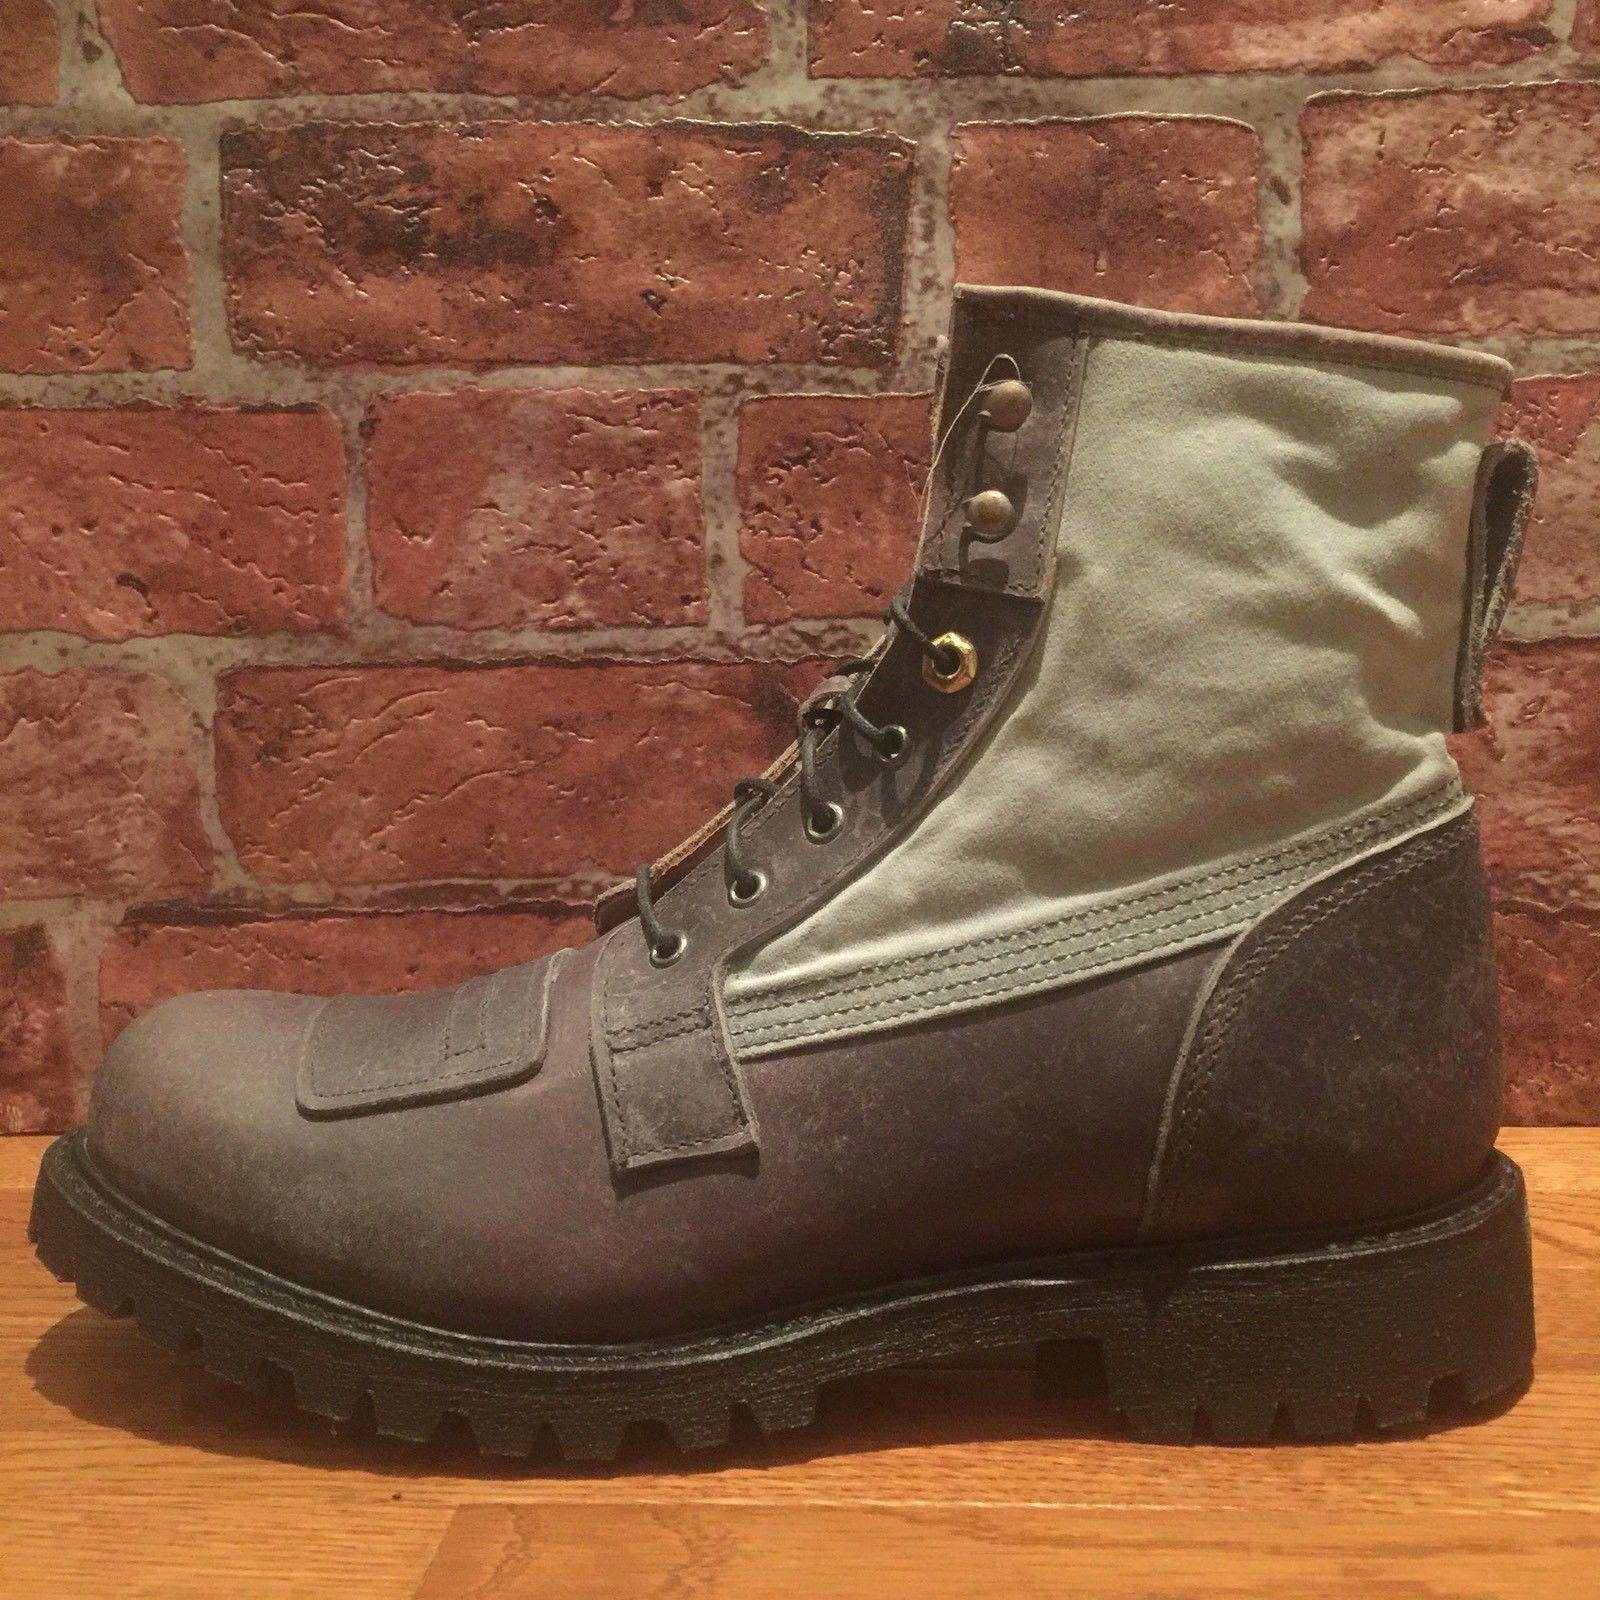 9717f8b9e67 MEN S TIMBERLAND BOOT COMPANY® 6-INCH LINEMAN BOOTS STYLE A1JJH010.